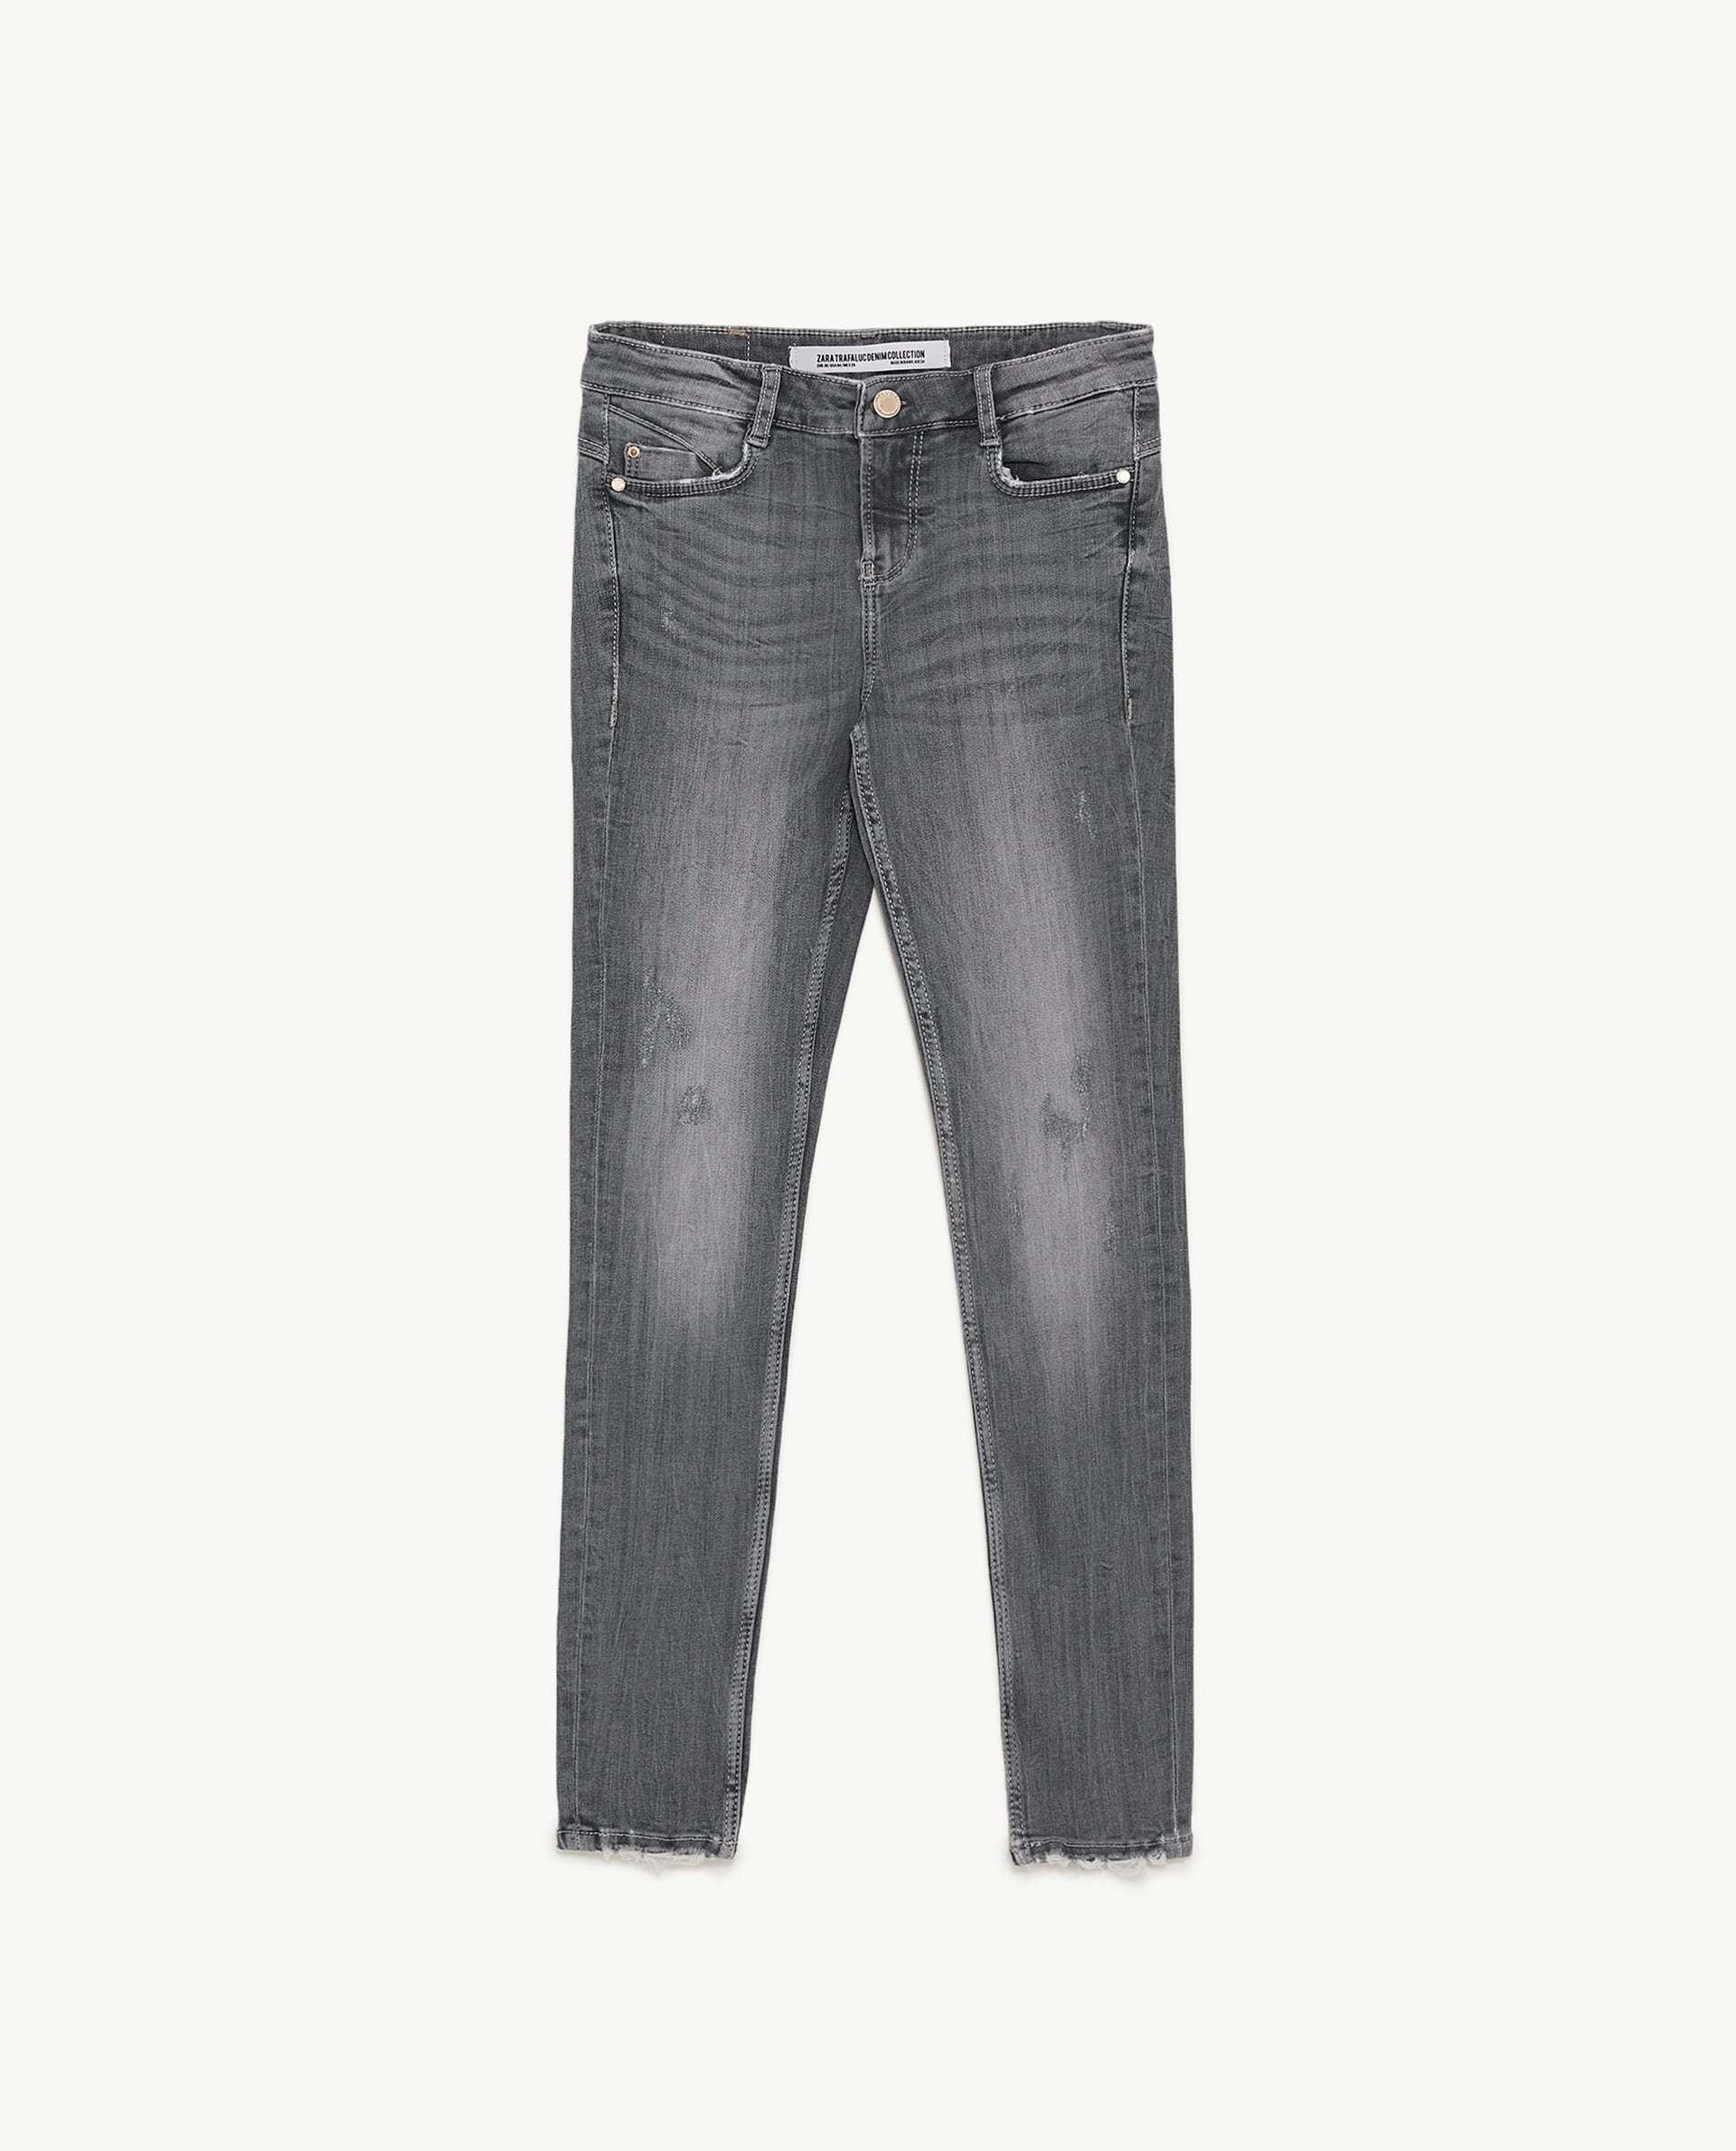 Vaquero gris desgastado Zara (25,95 euros)